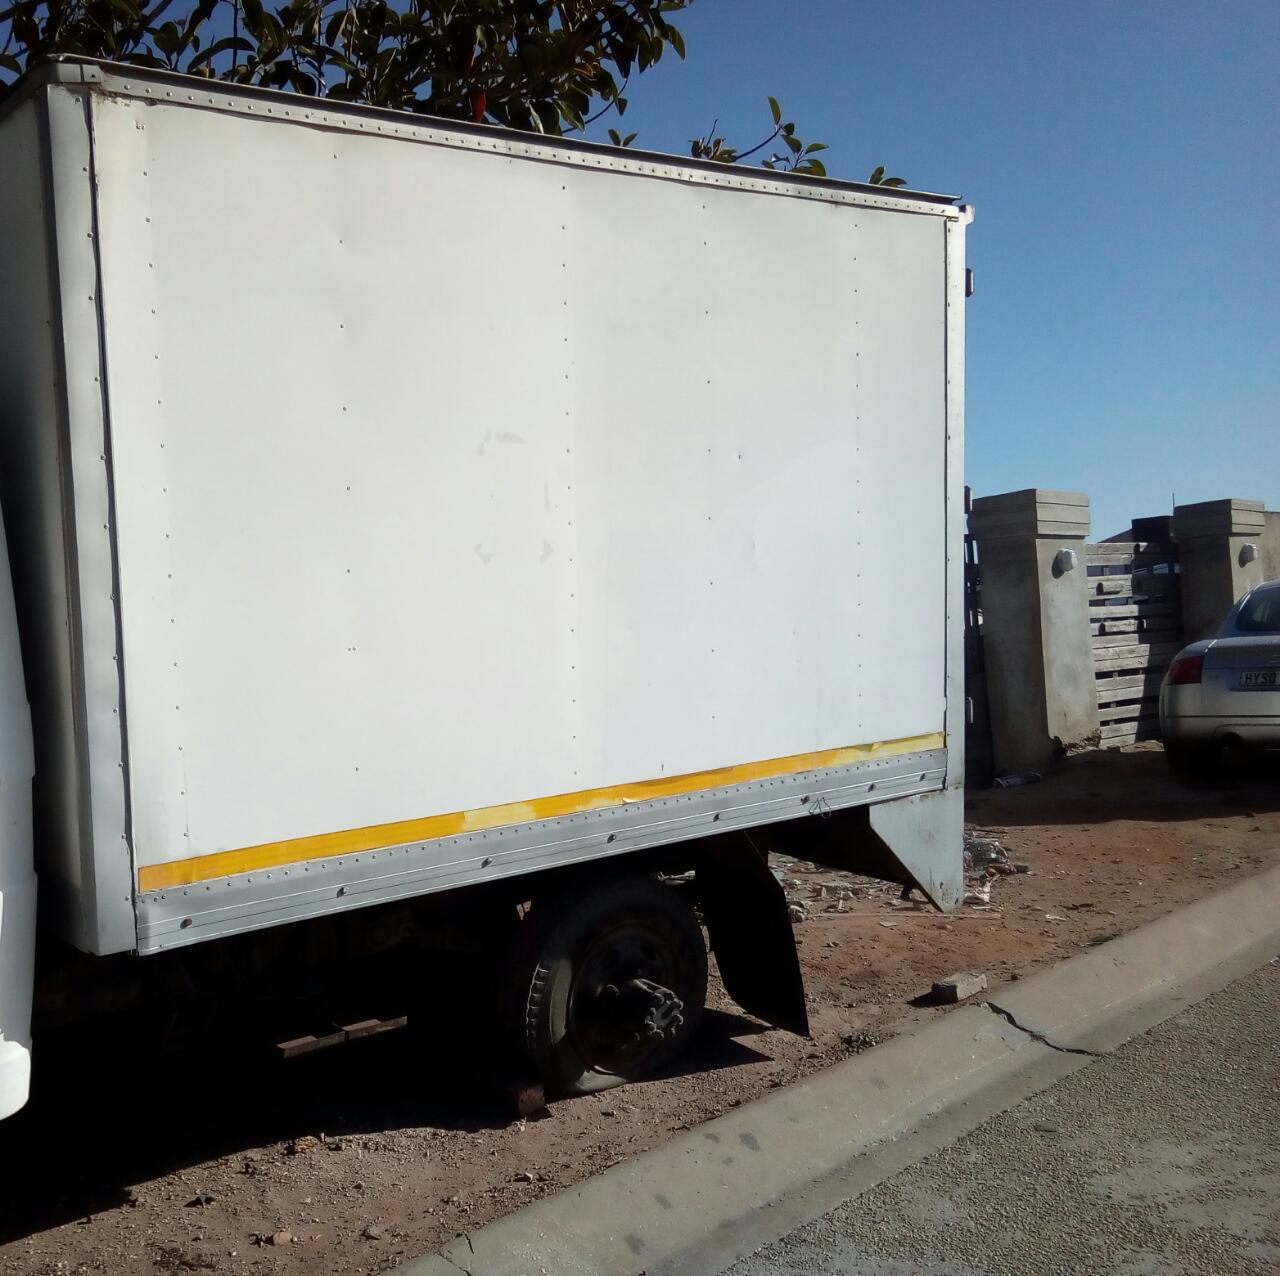 LOADBODY for 4 ton truck